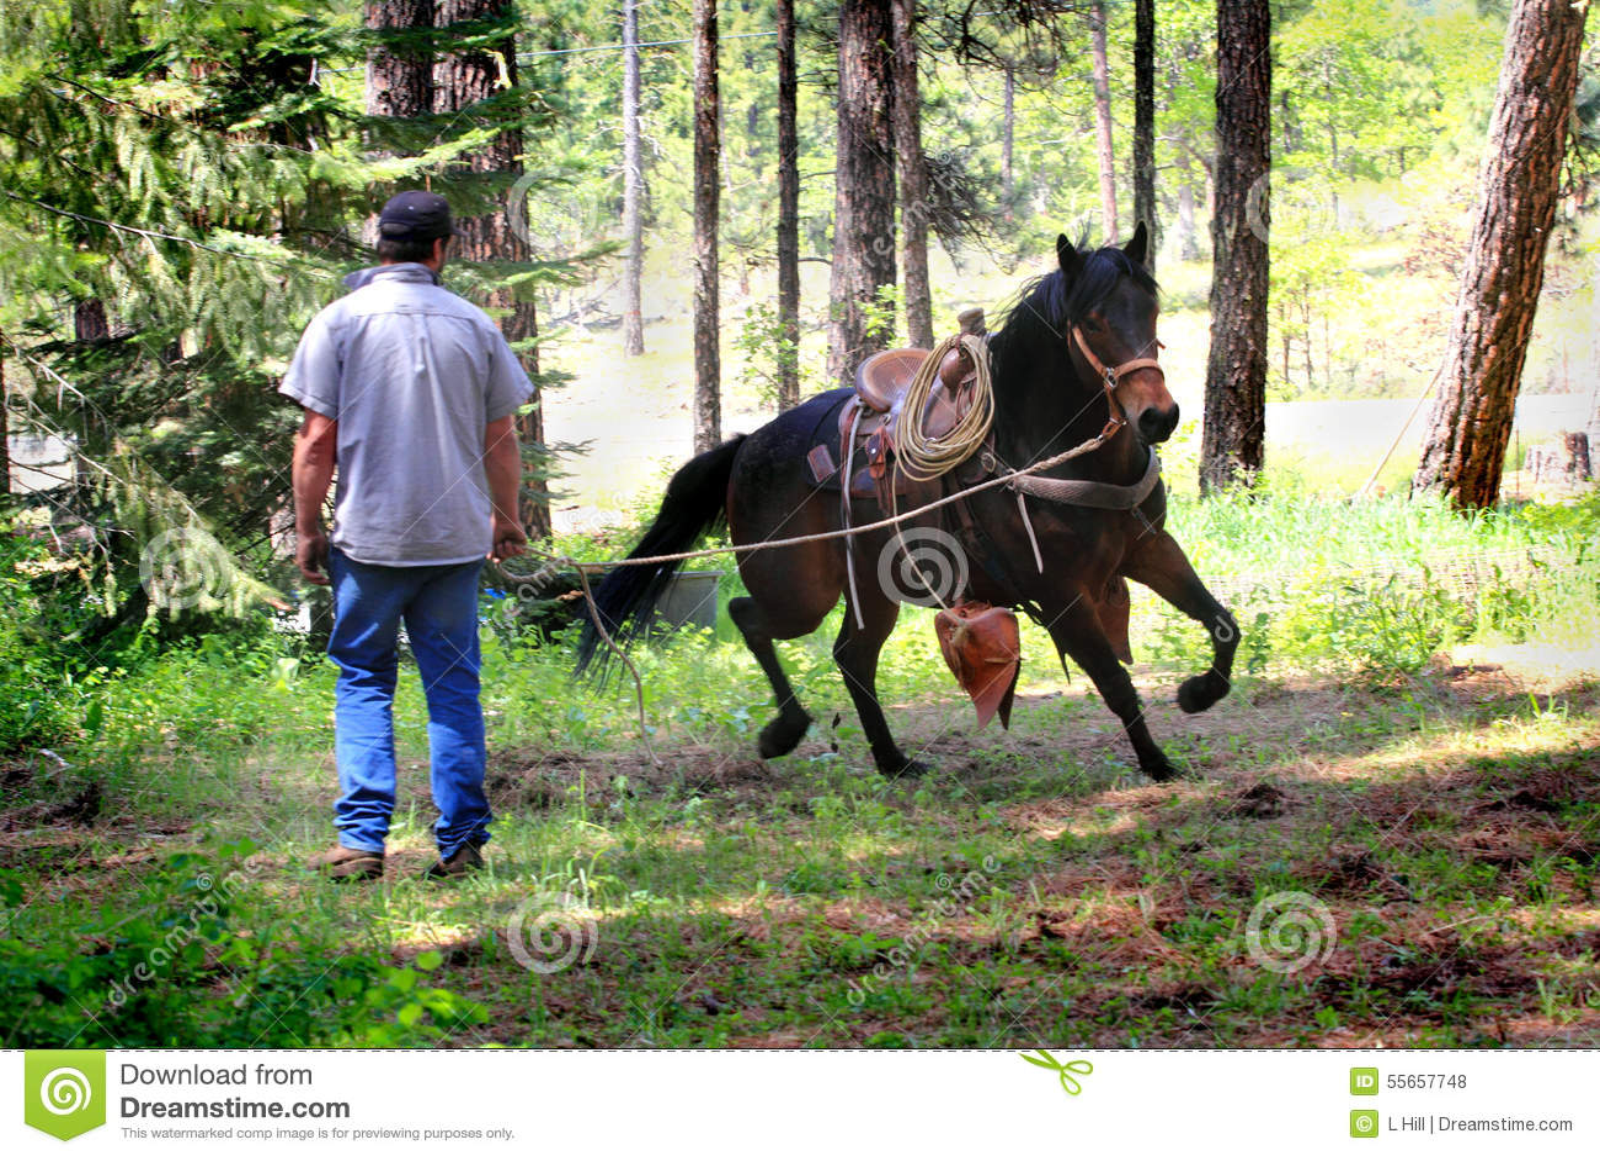 Vaquero Working Running Horse